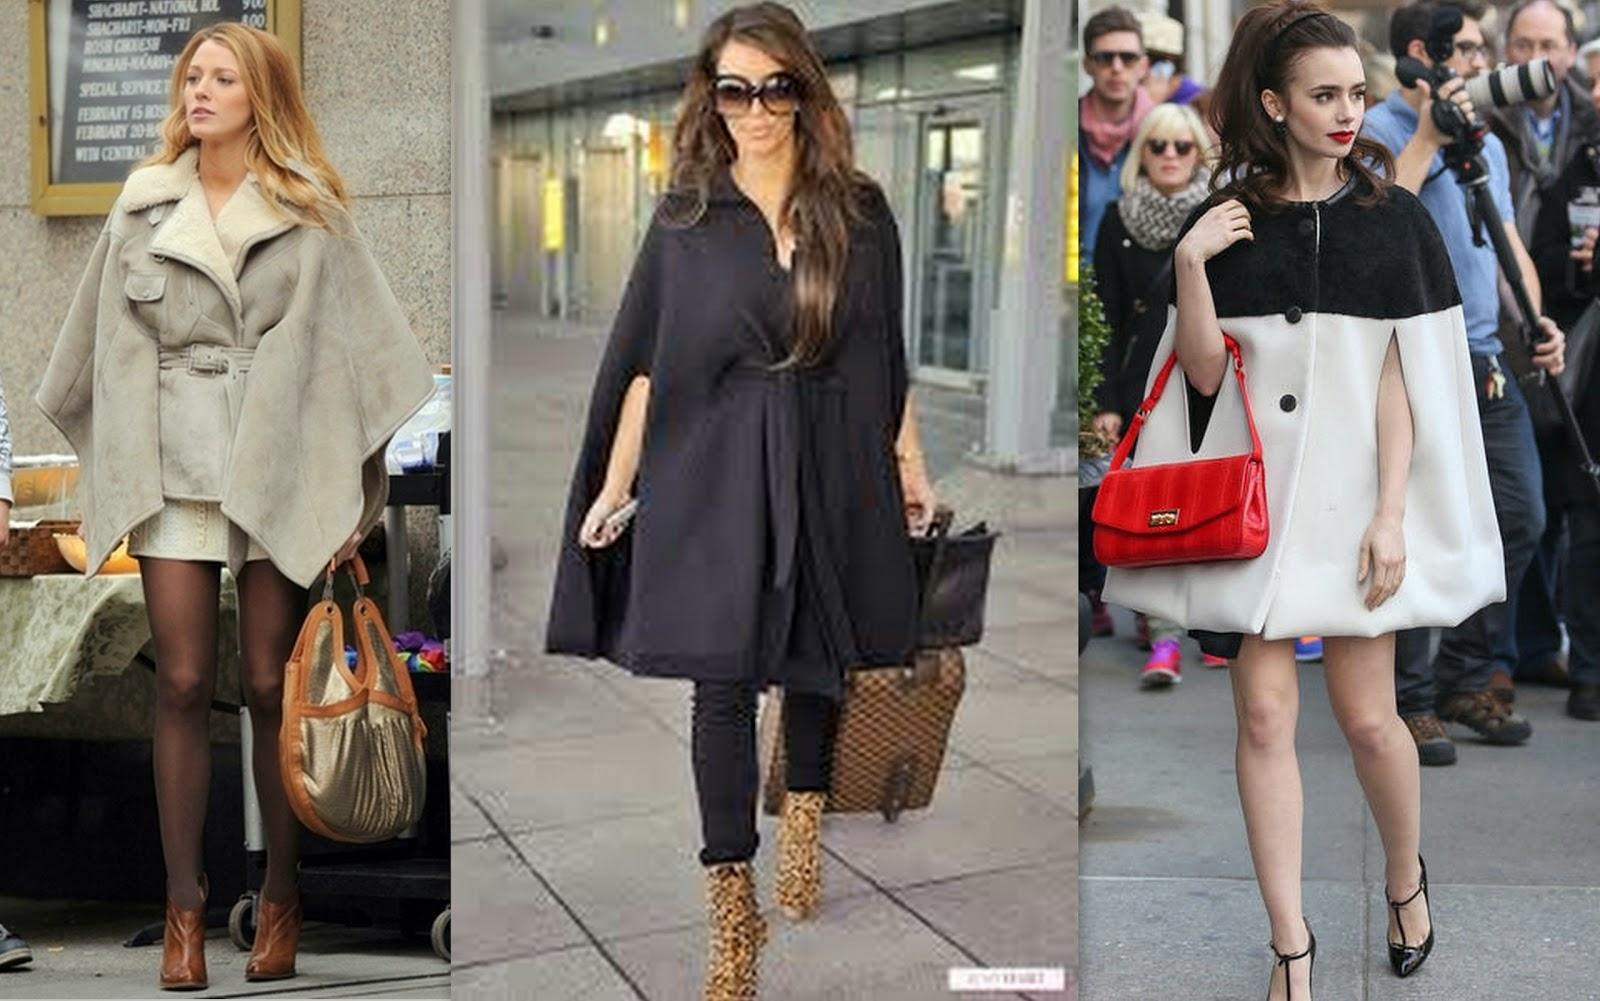 trend, cape trend, celebrities in cape coat, cape trend fall winter inspiration